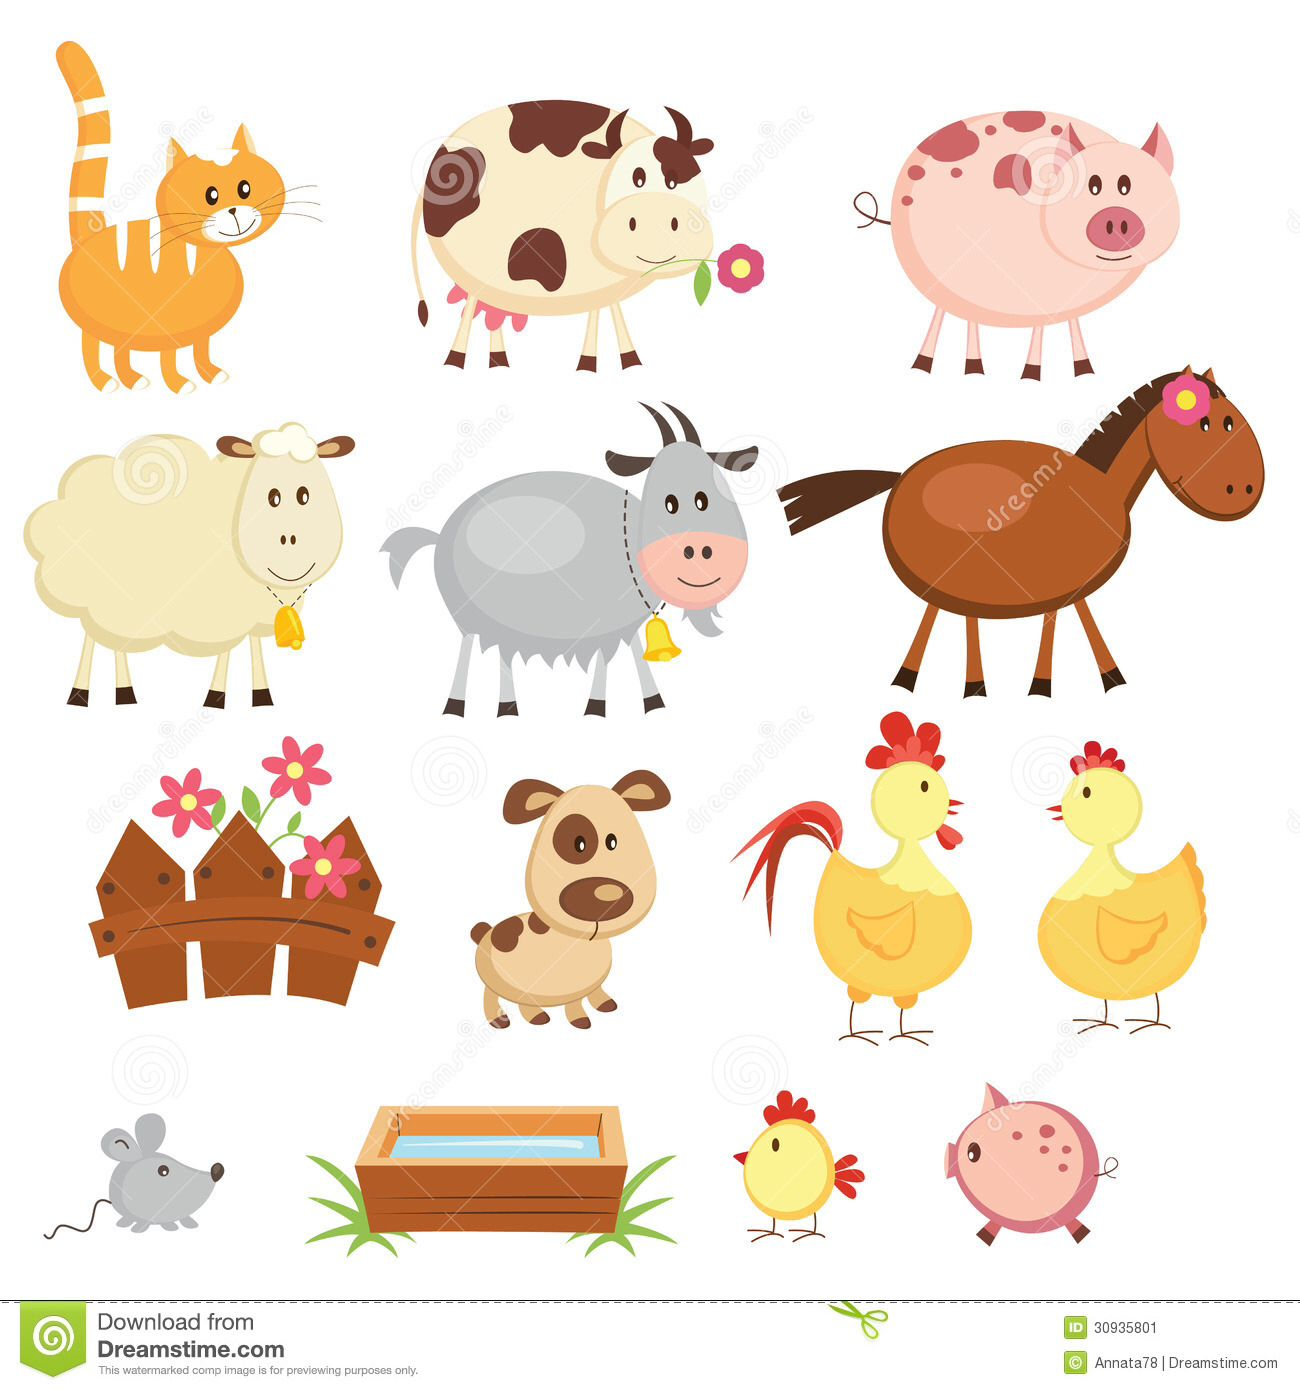 Farm animals | Clip Art | PinterestClip Art Pictures Of Farm Animals